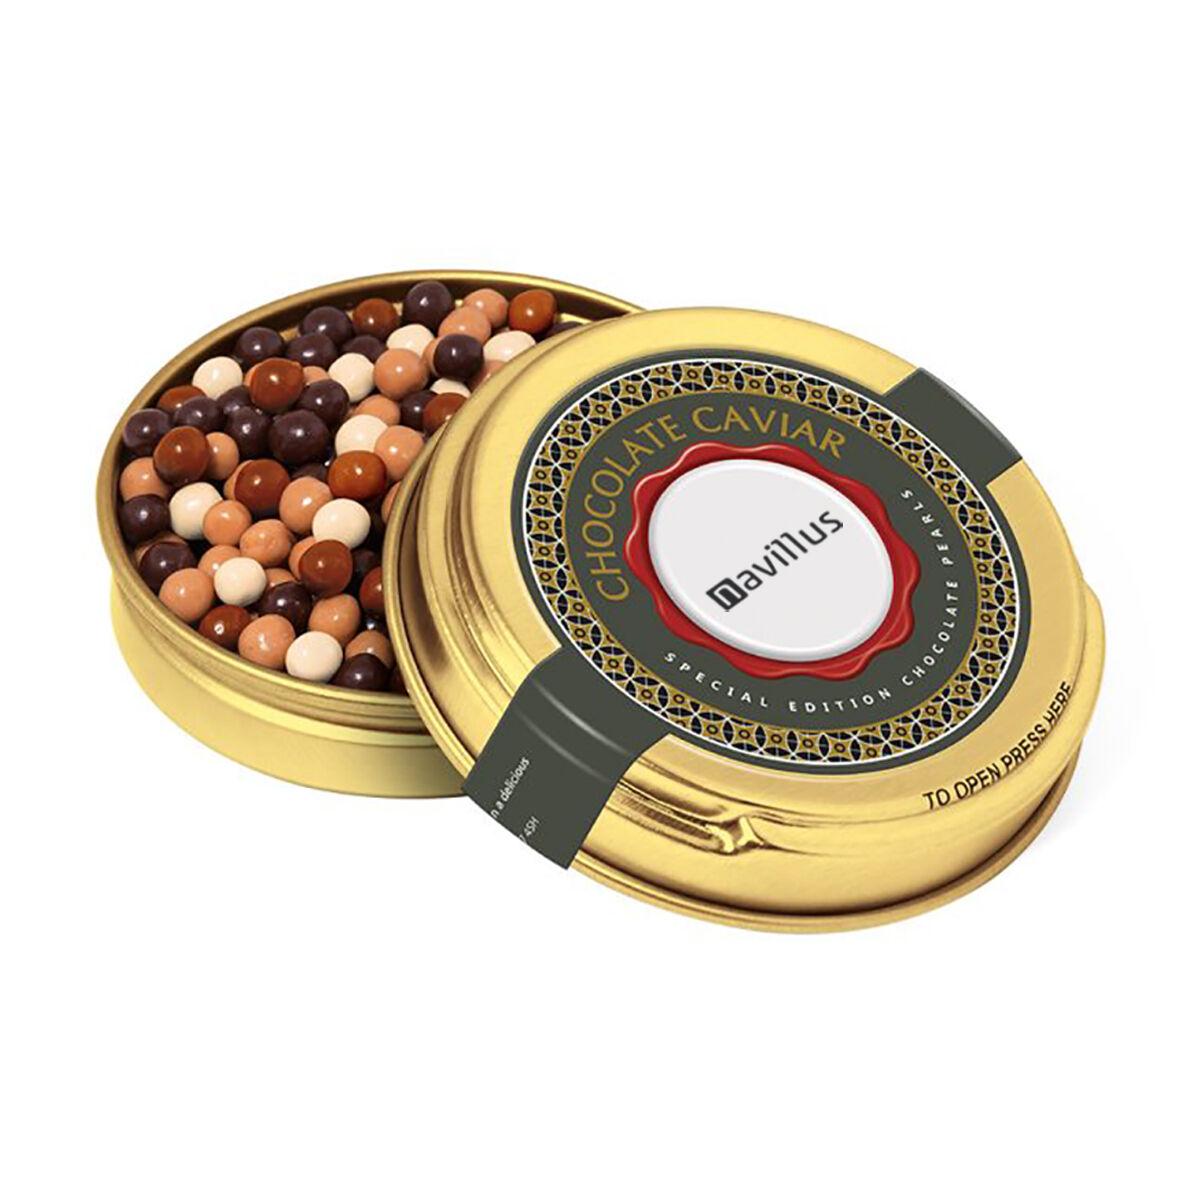 Chocolate Pearls in Caviar Tins